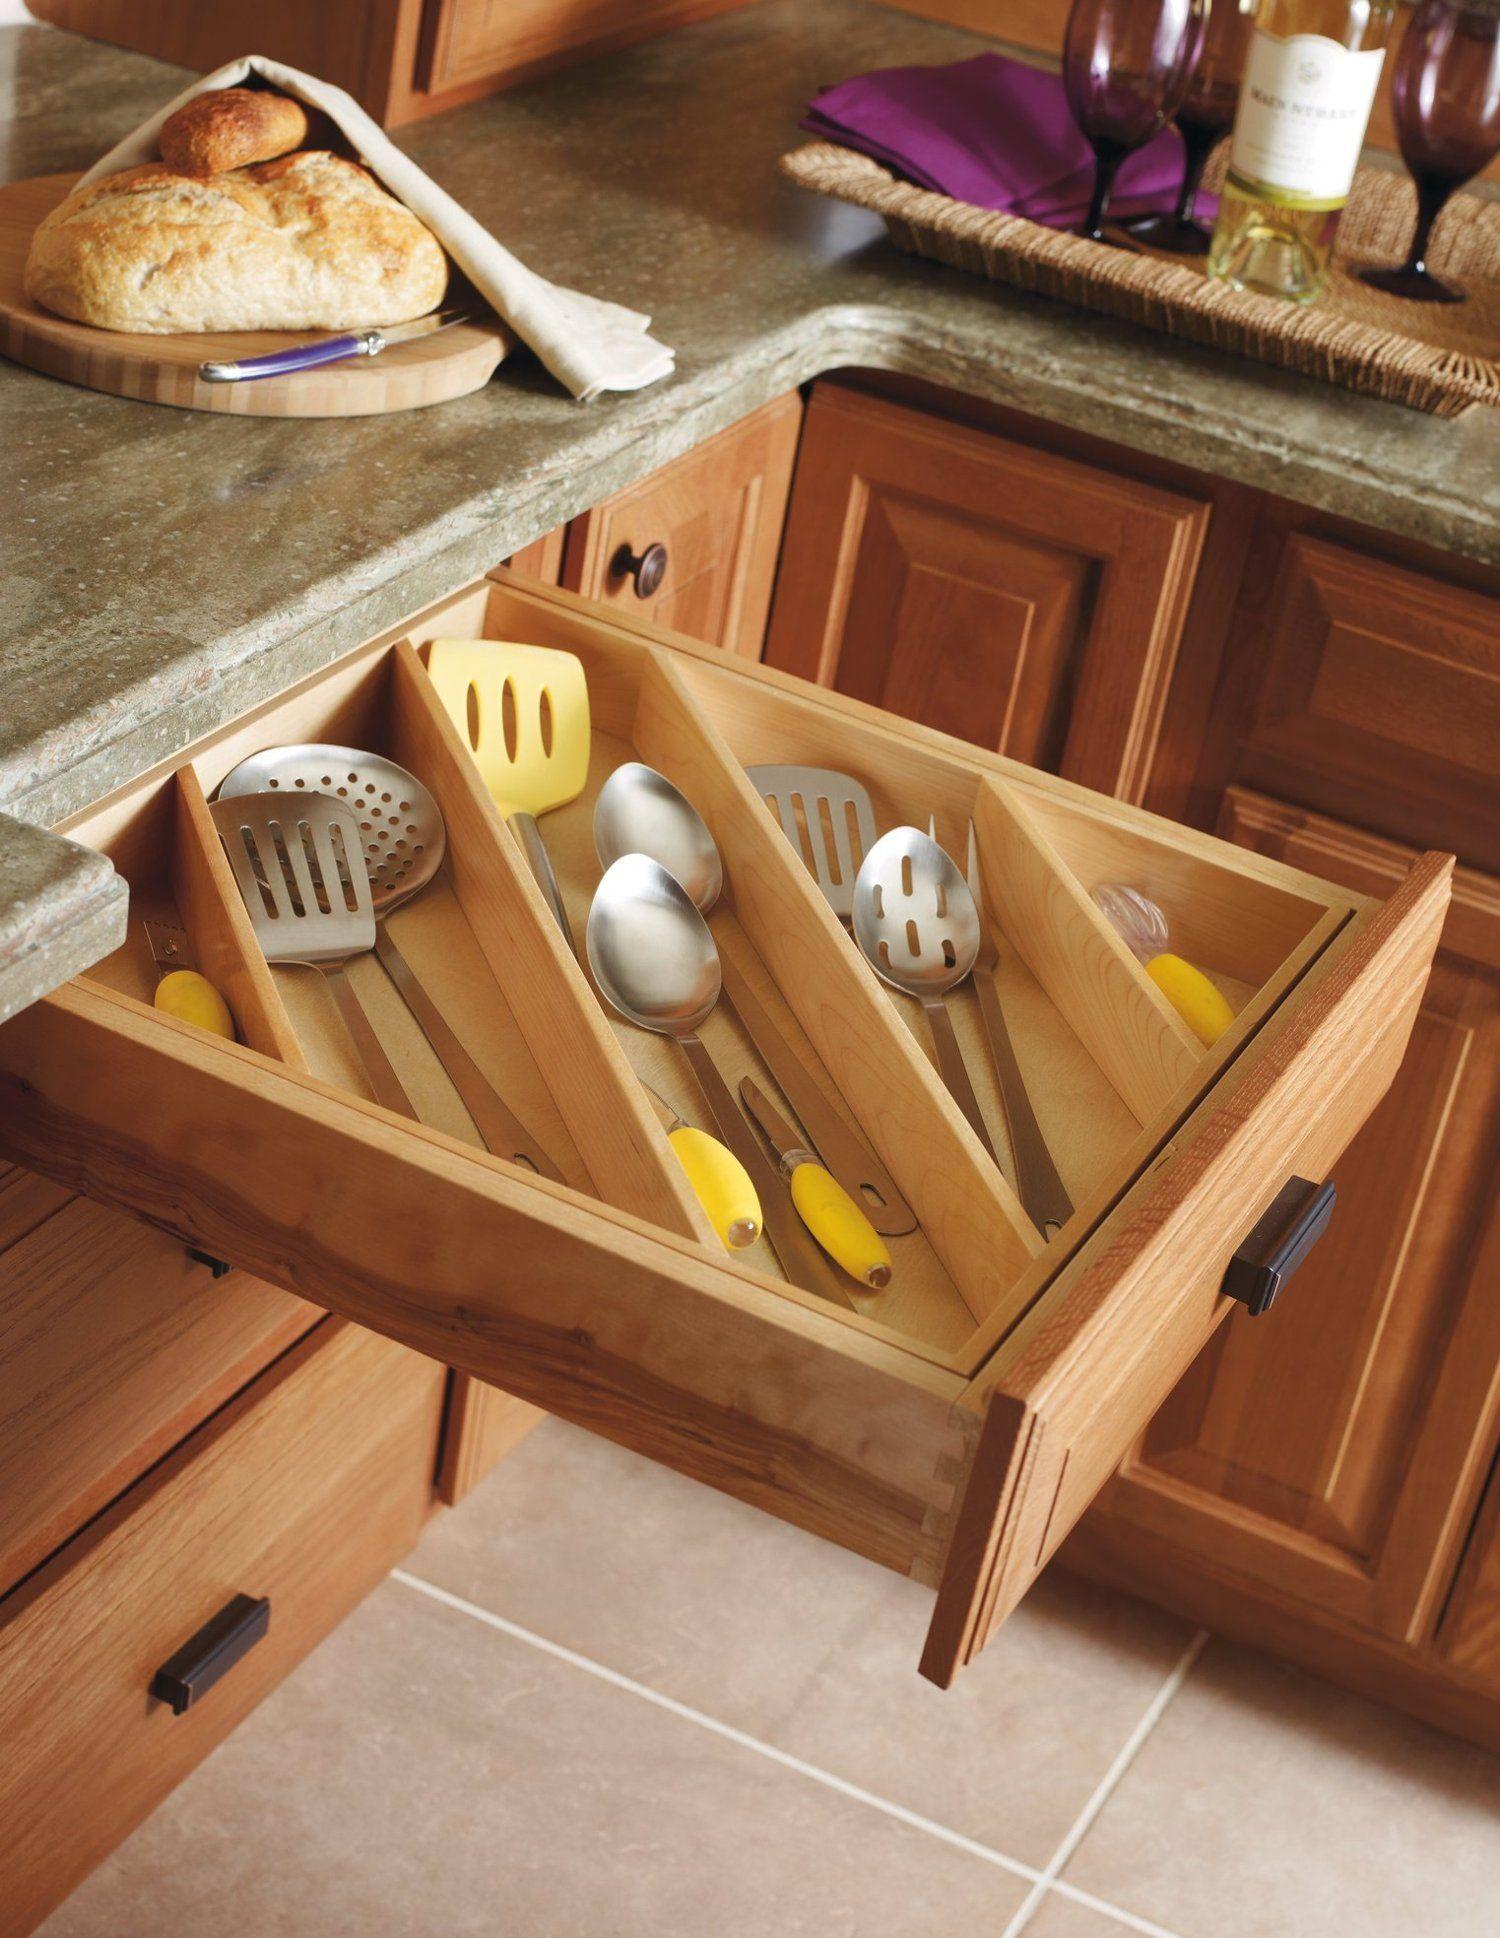 Kitchen Drawers Organizers Make The Most Of Kitchen Drawersorganizing Diagonally